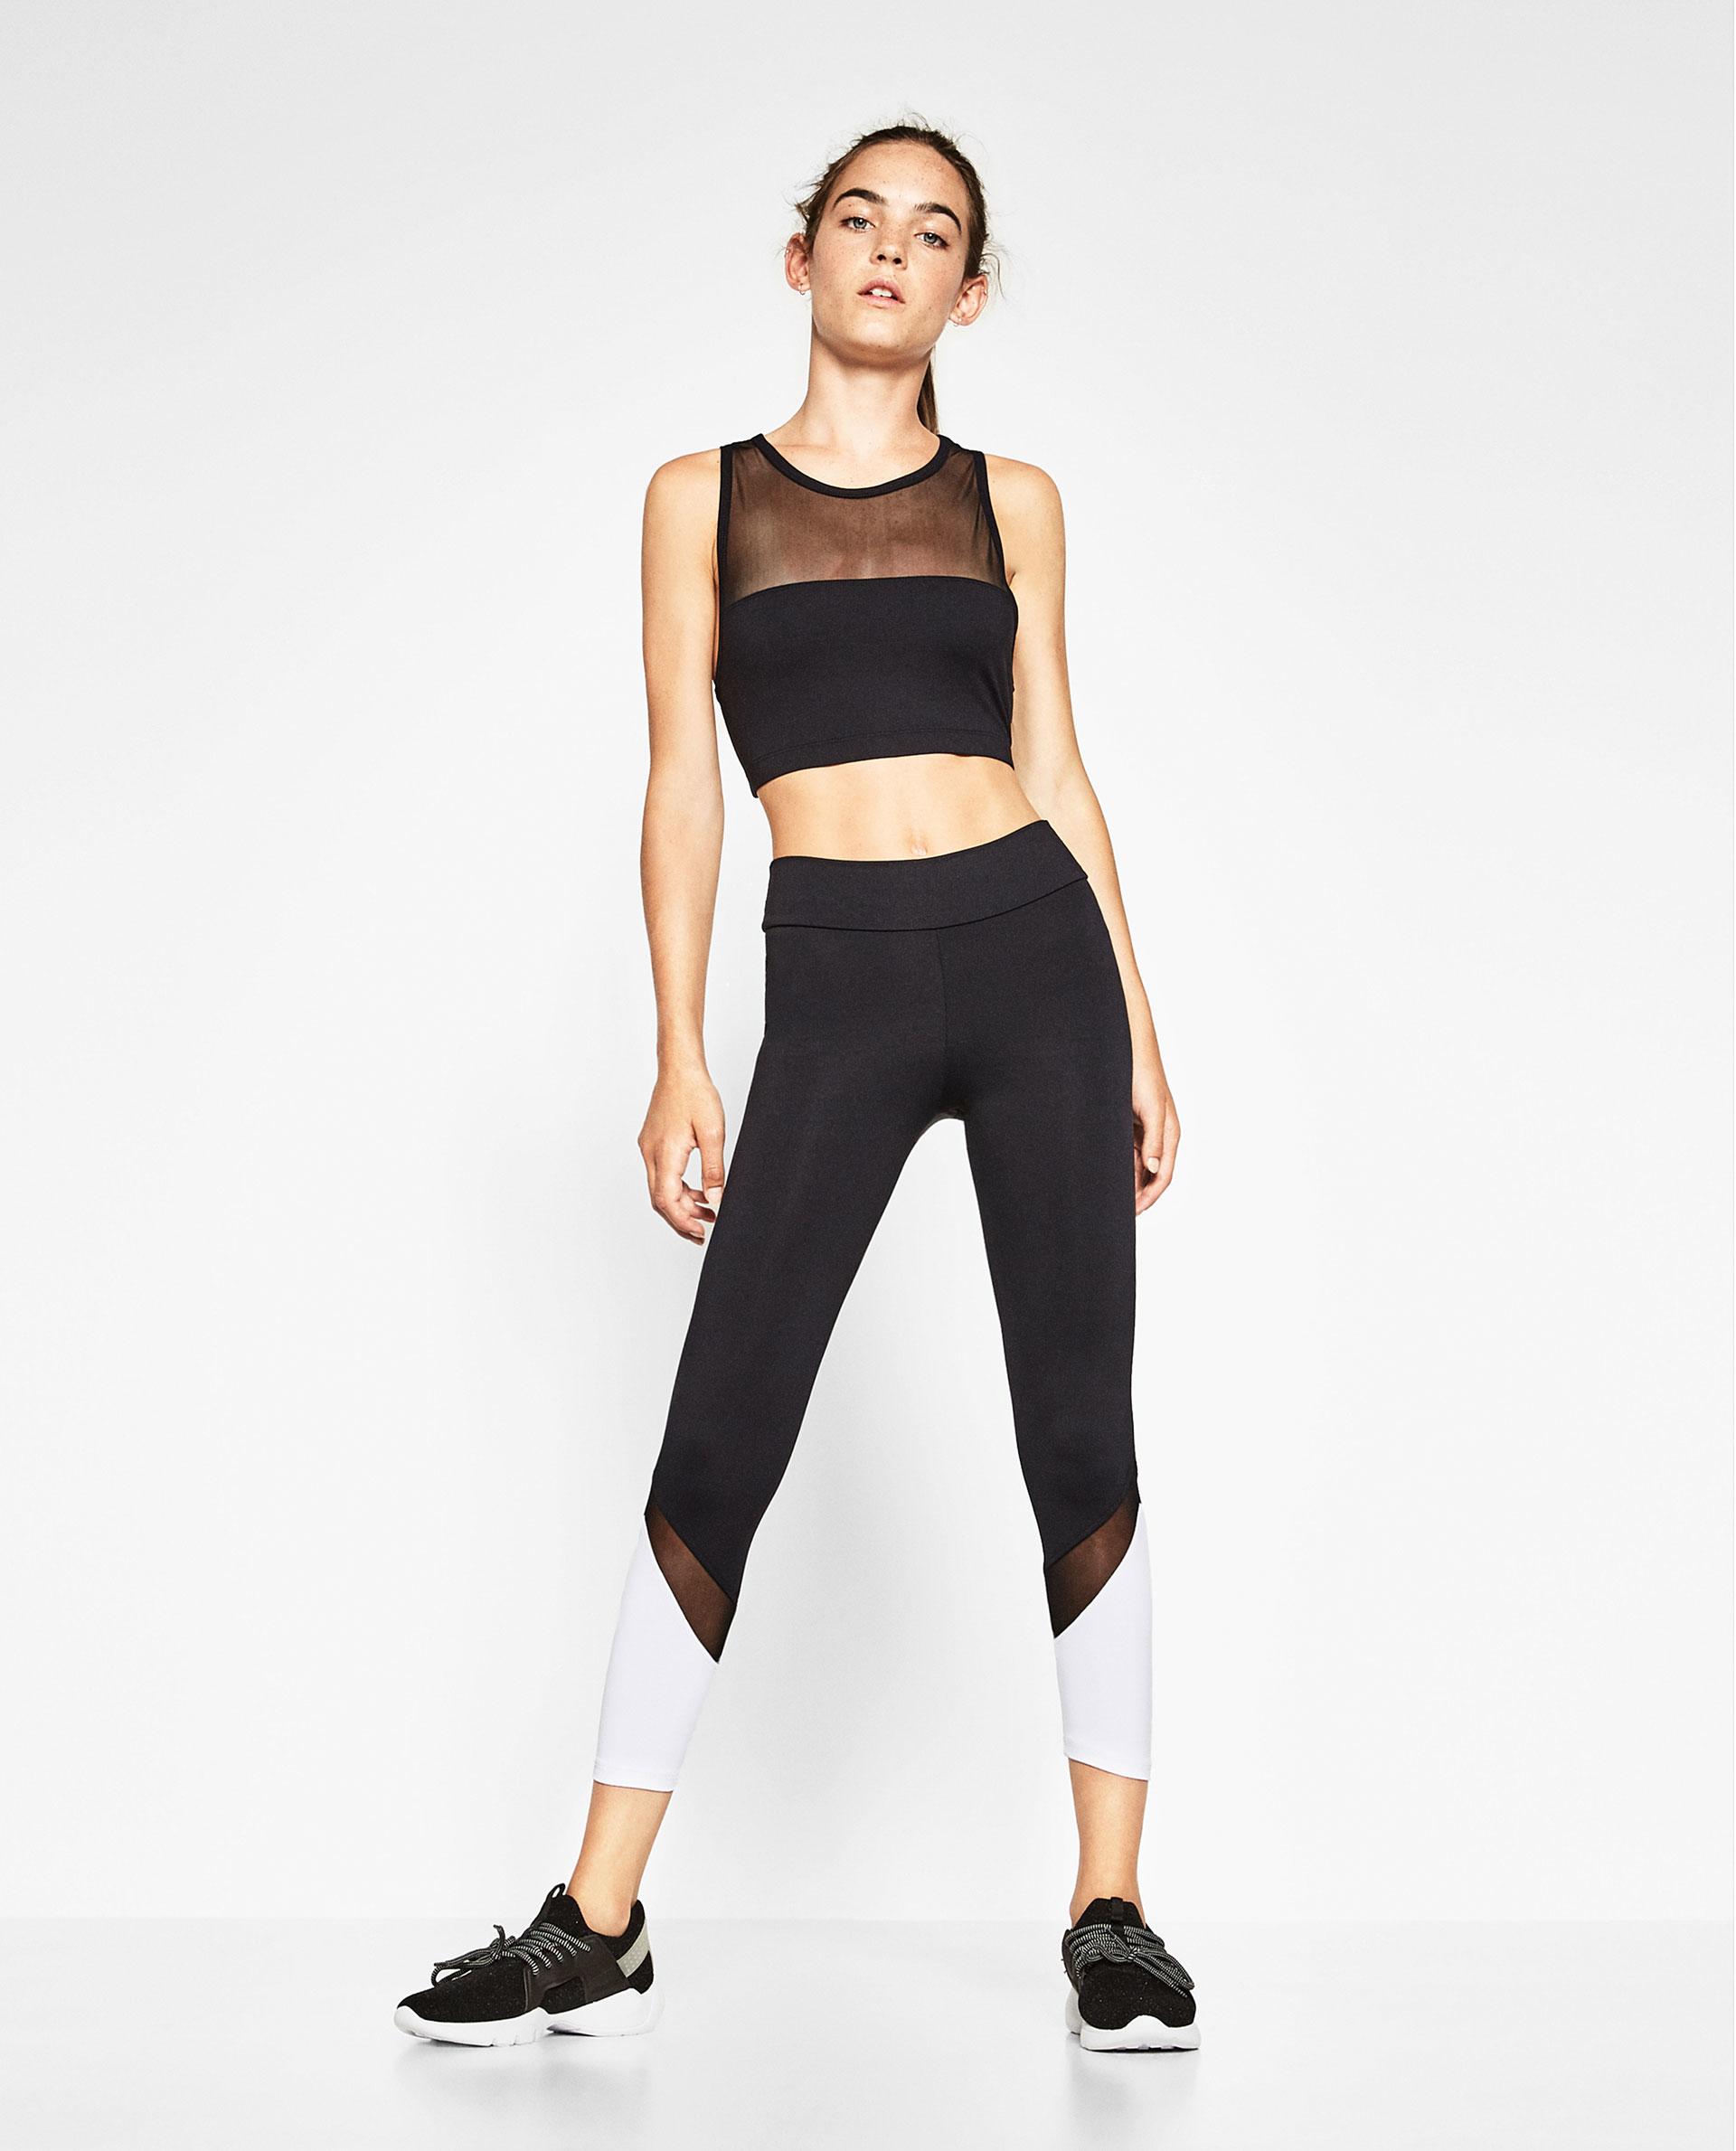 Zara Two-toned Sports Leggings